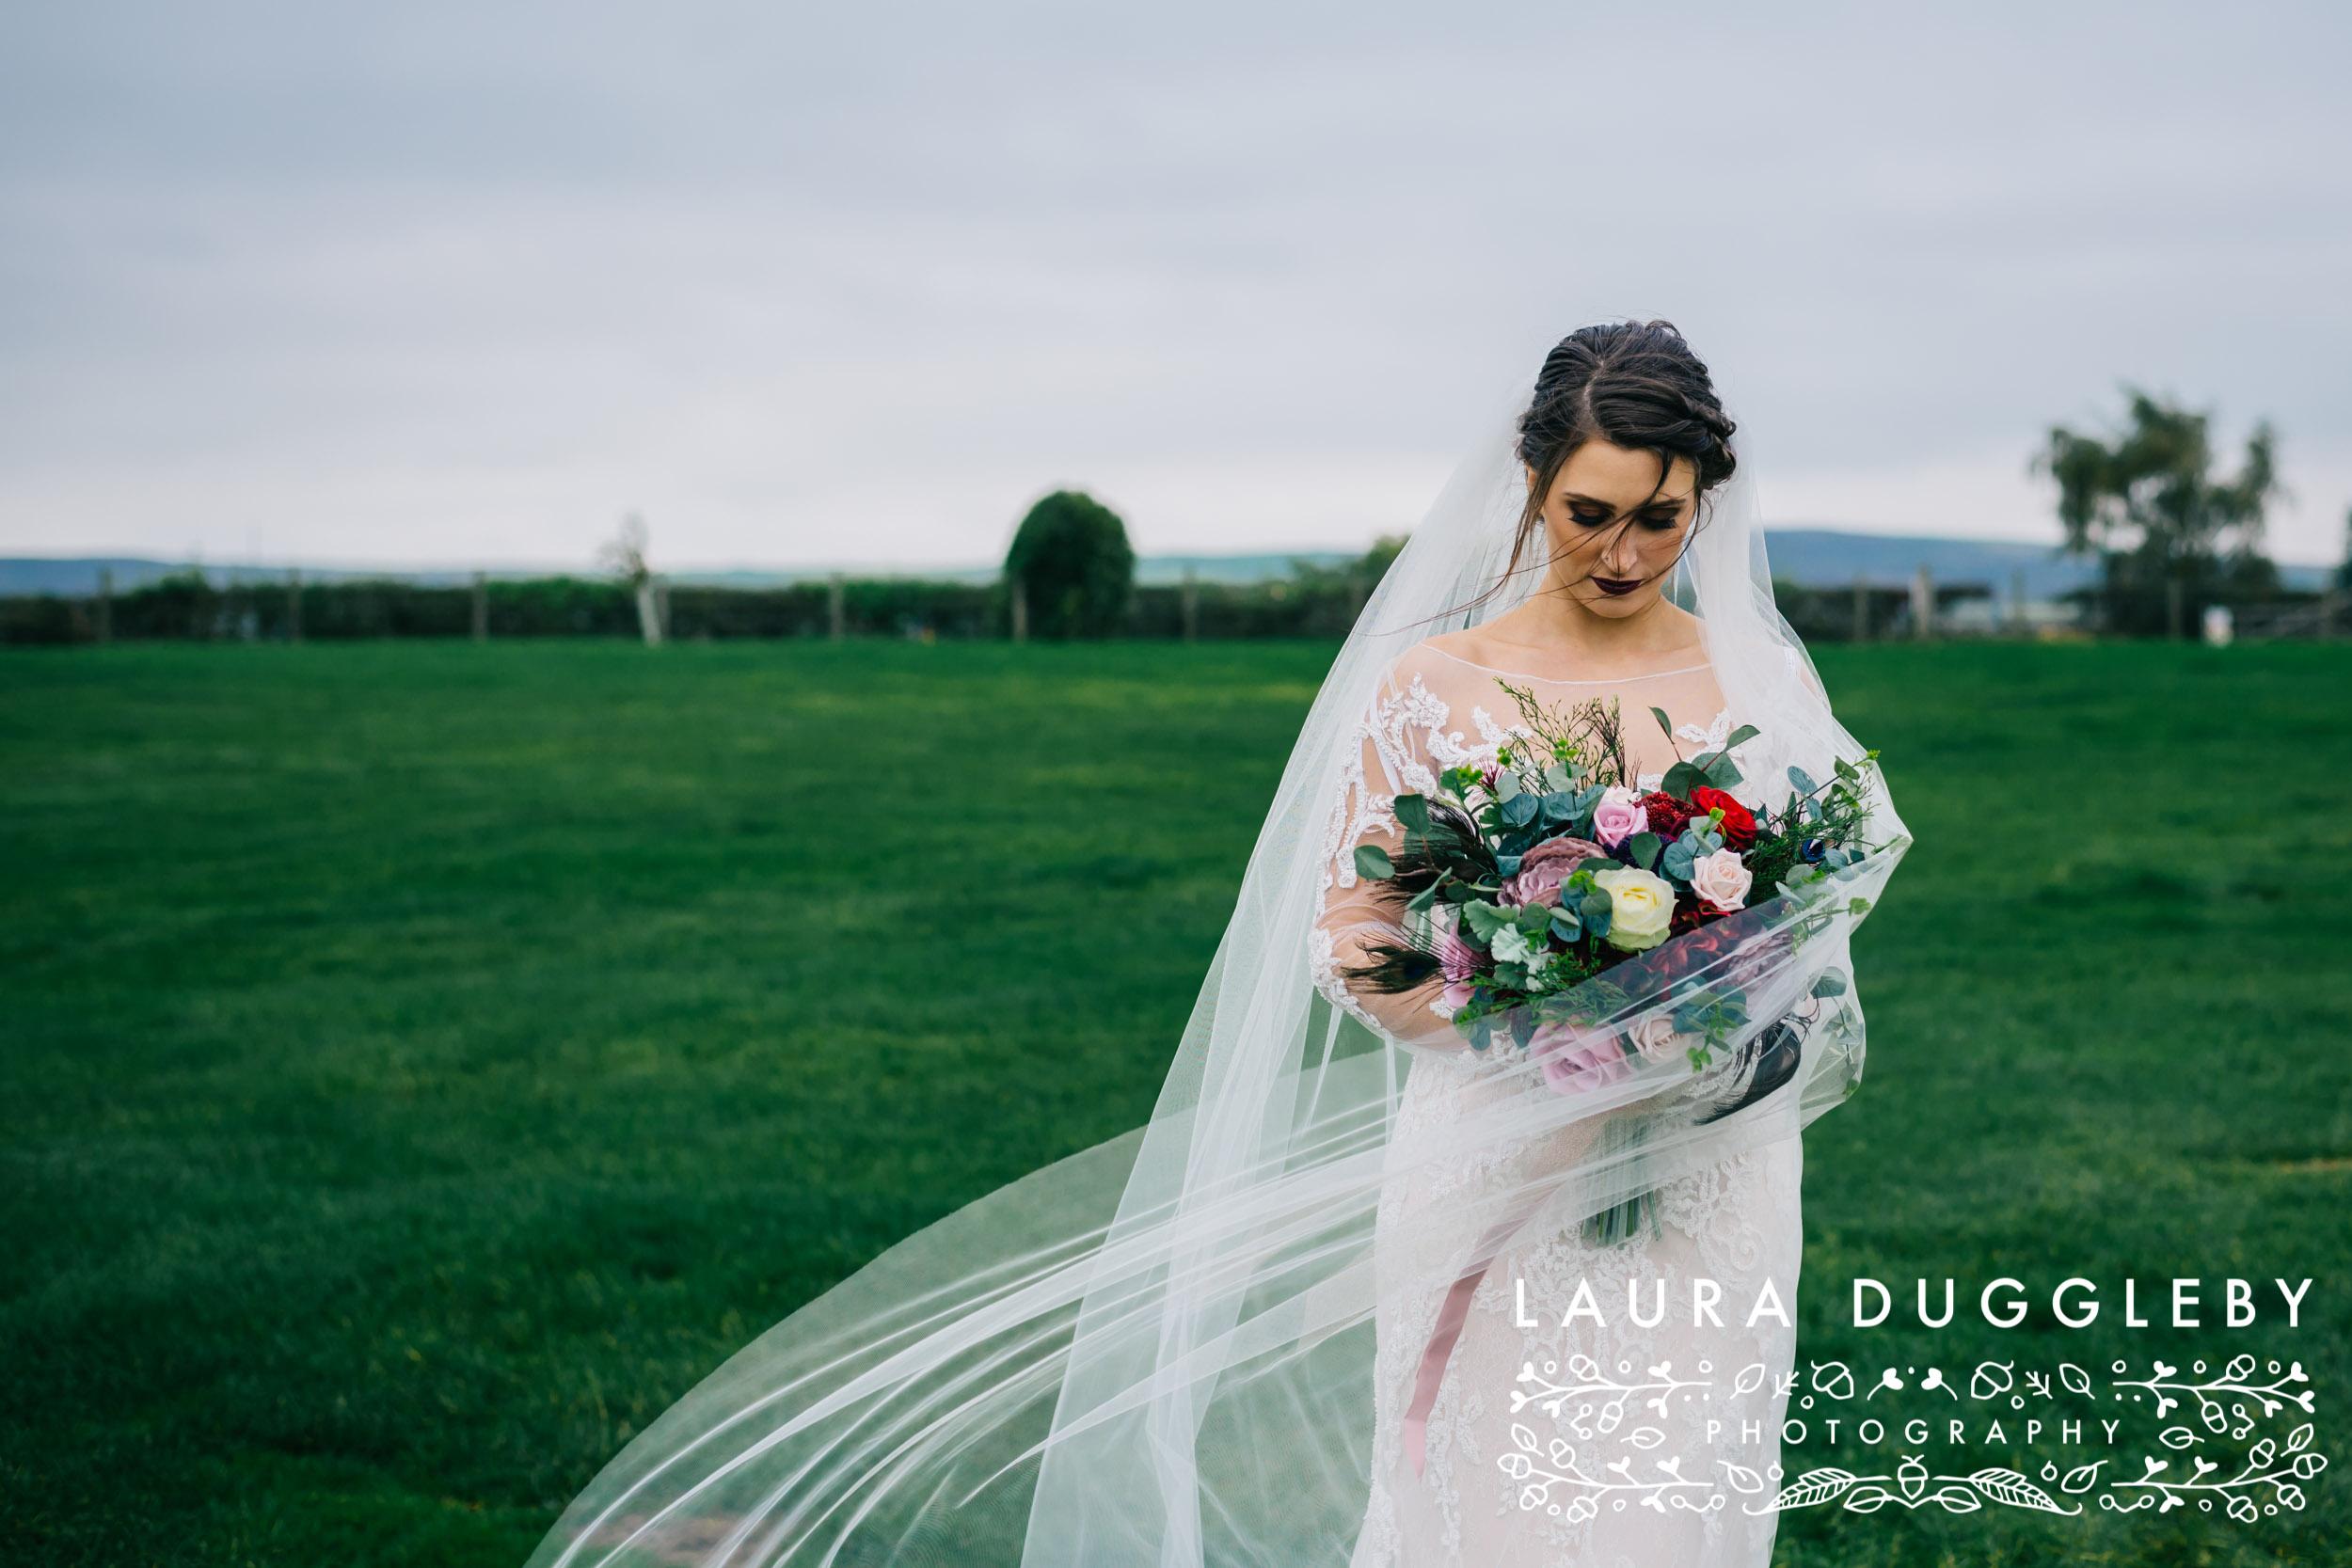 Skipton Wedding Photographer - Thornton Hall Country Park Wedding Photographer5